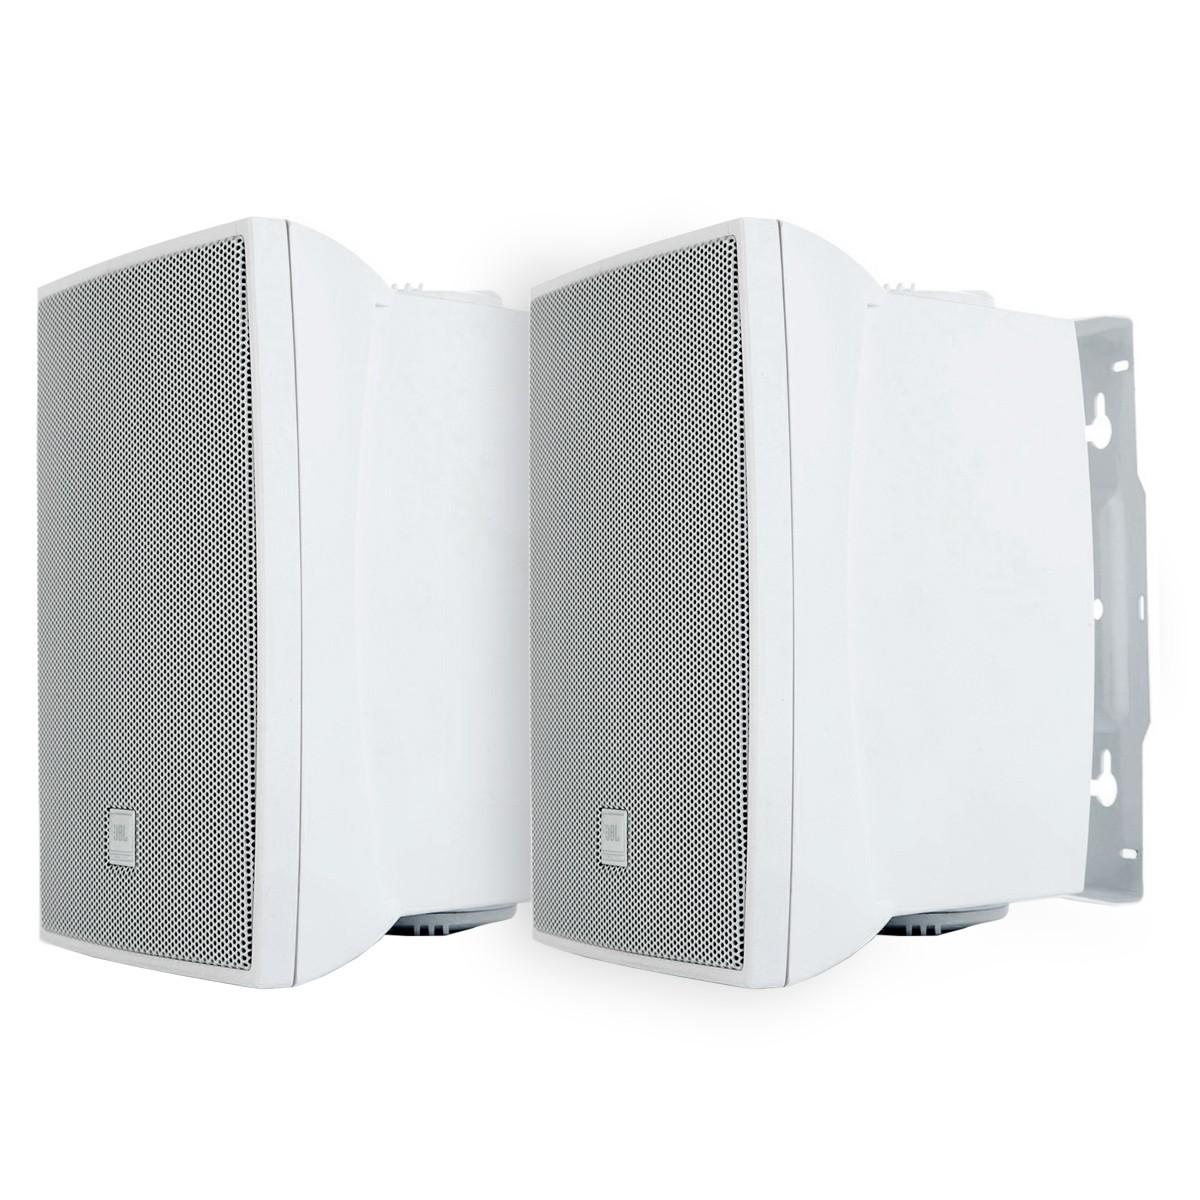 Caixa Passiva p/ Som Ambiente Fal 6 Pol 50W (Par) - C 621 B JBL